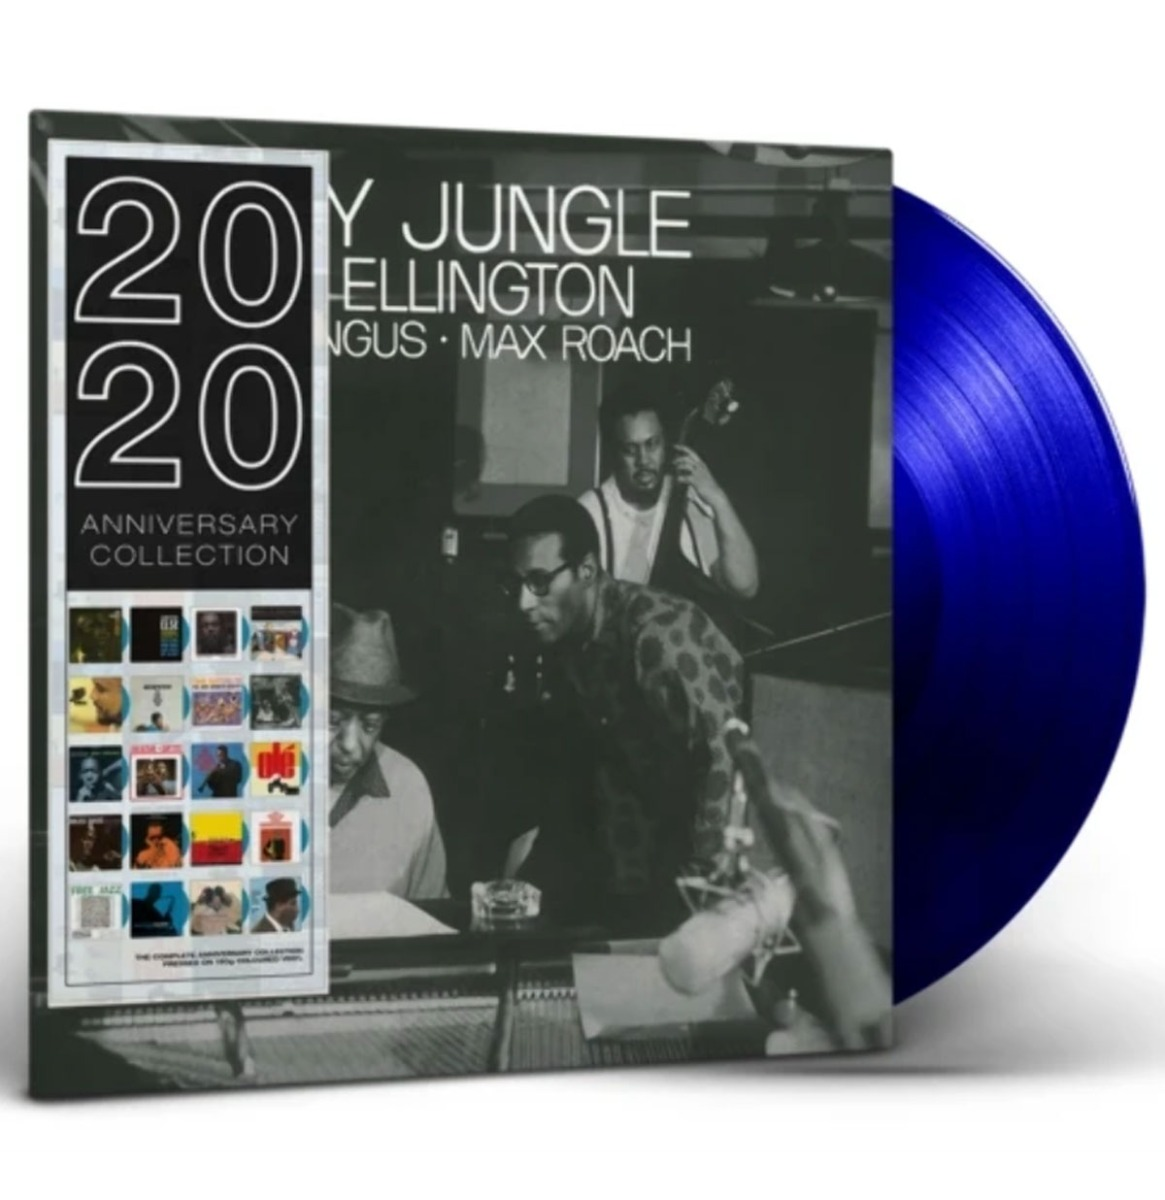 Duke Ellington - Money Jungle Blue Coloured LP